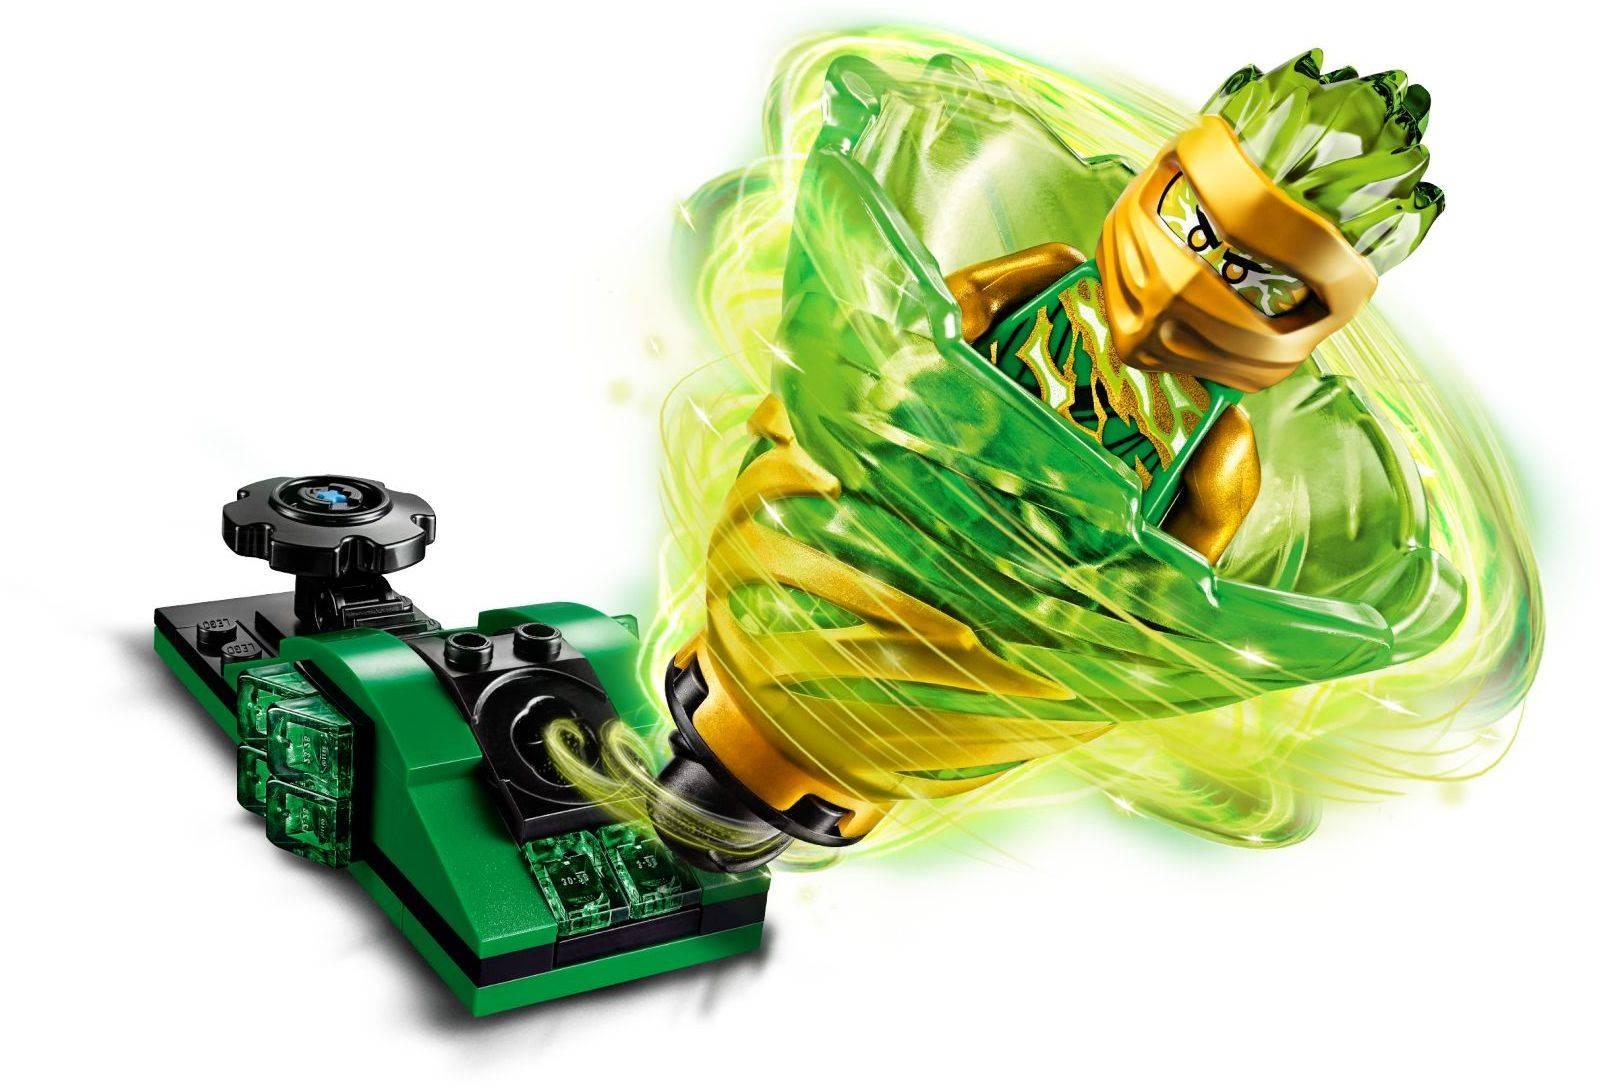 factory outlets fast delivery classic style Lego 70681 Ninjago Spinjitzu Slam - Lloyd